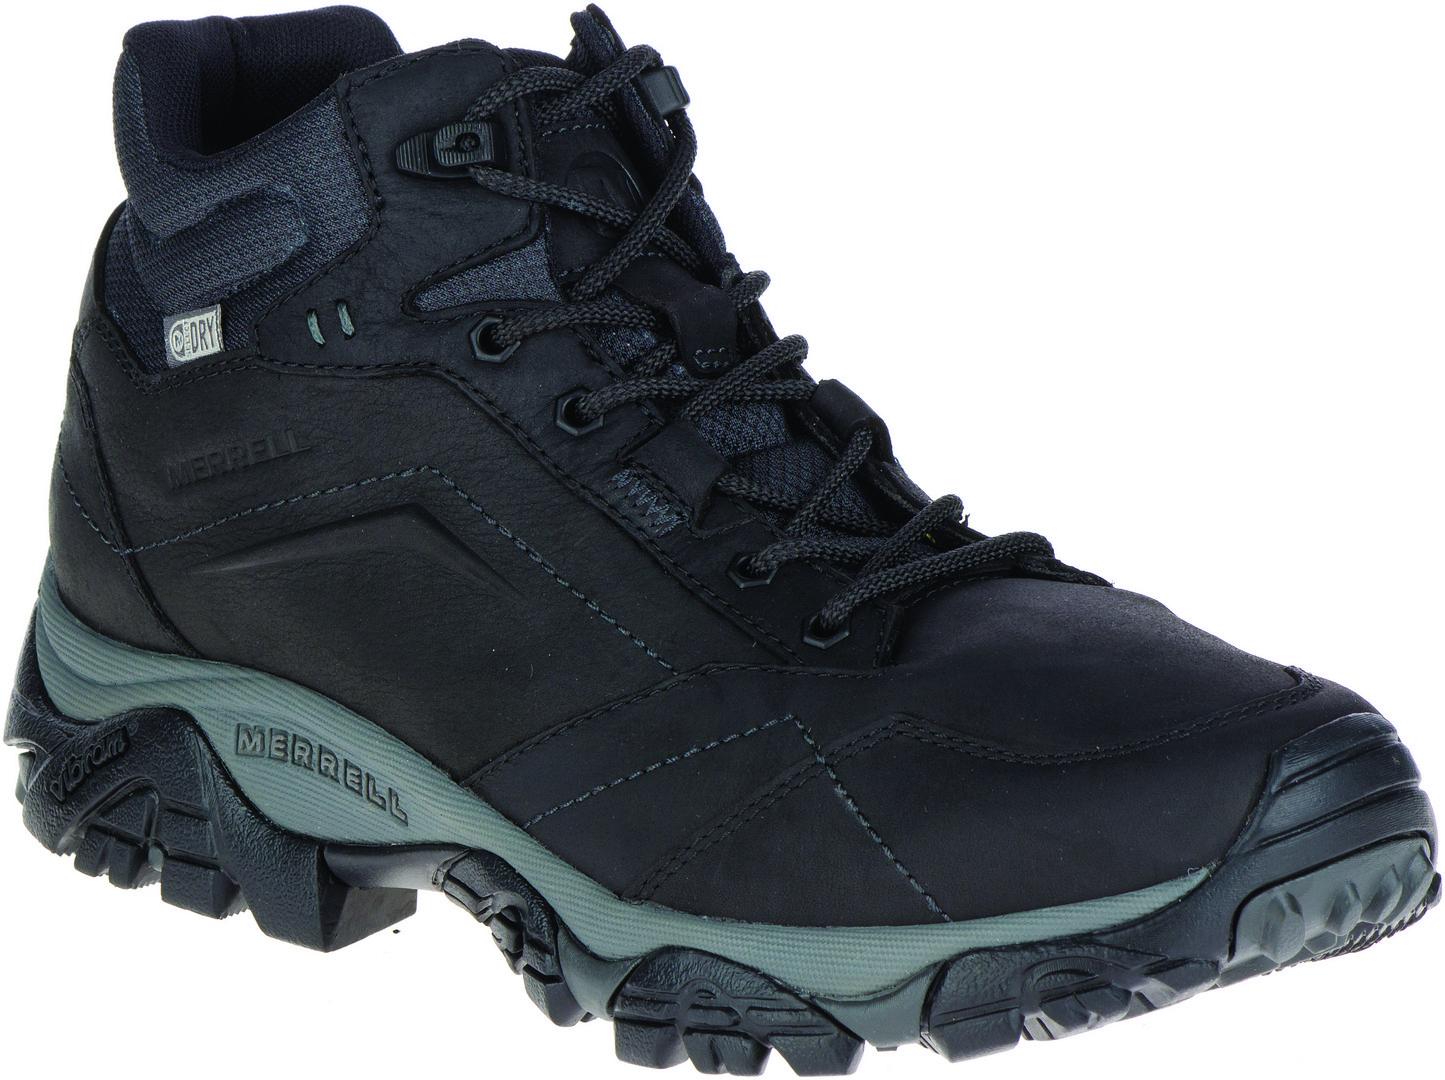 Merrell MOAB ADVENTURE MID WP, muške cipele za planinarenje, crna